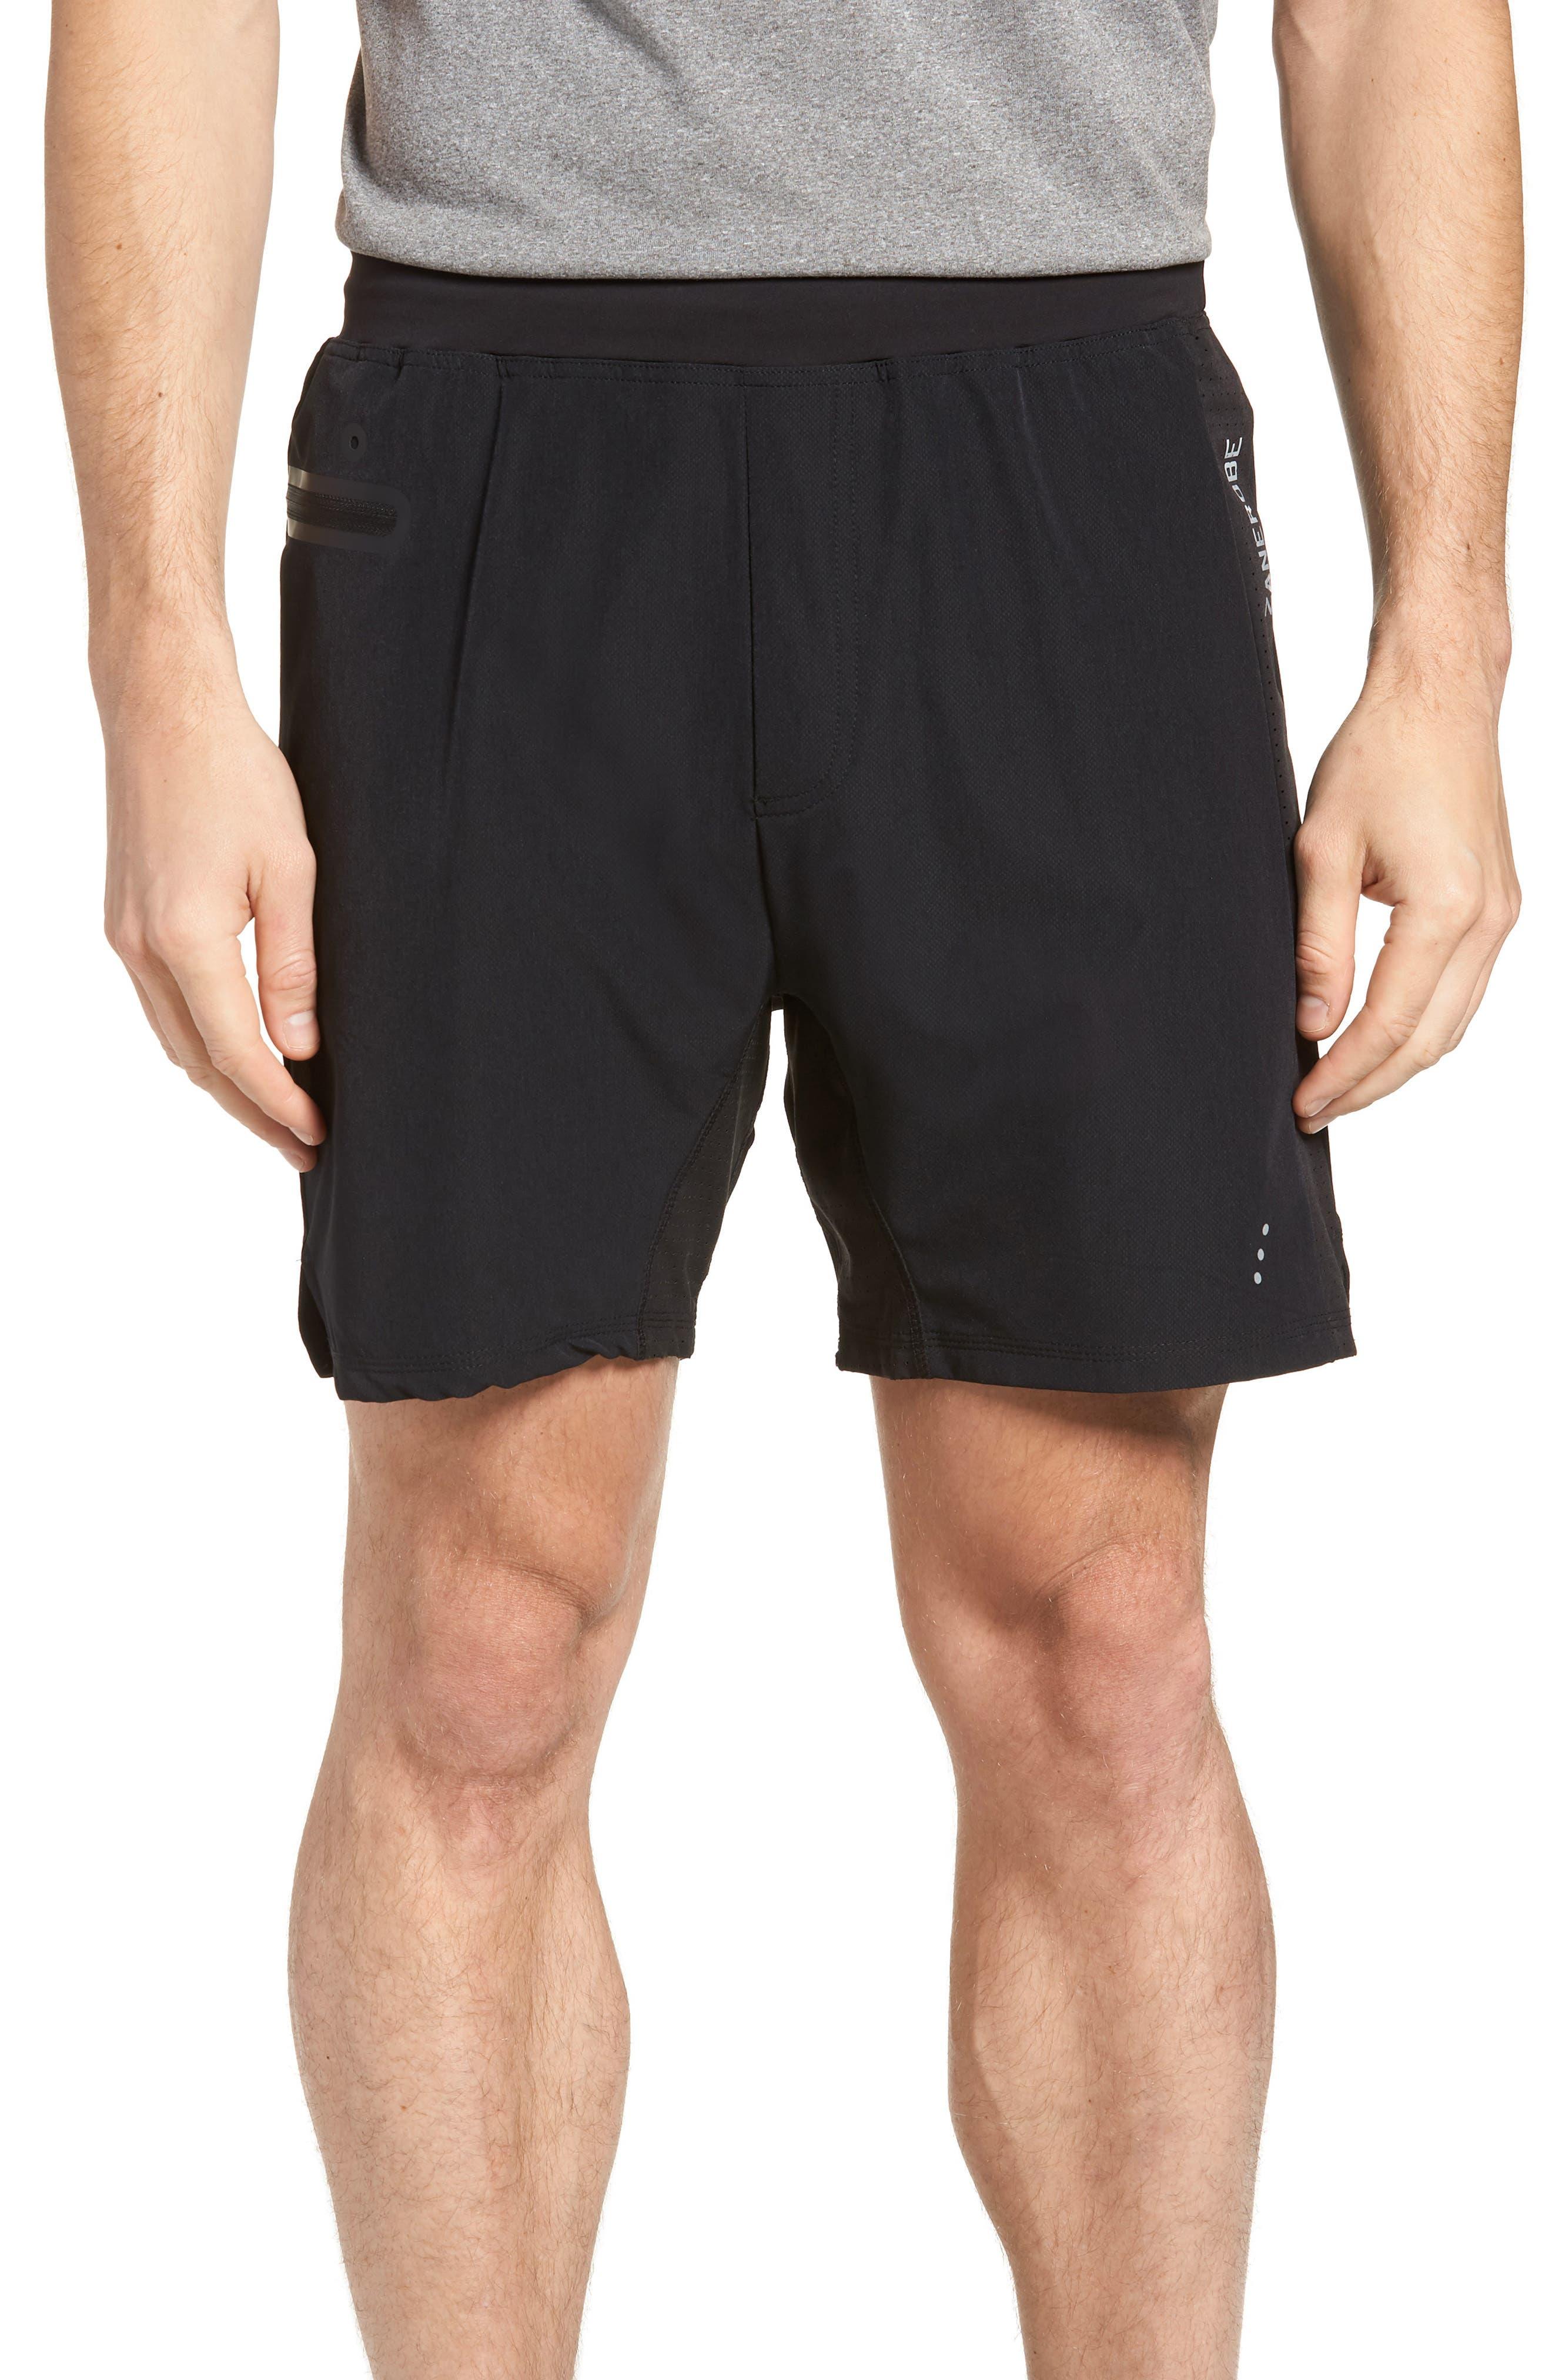 ZANEROBE Type 1 Shorts,                             Main thumbnail 1, color,                             Black